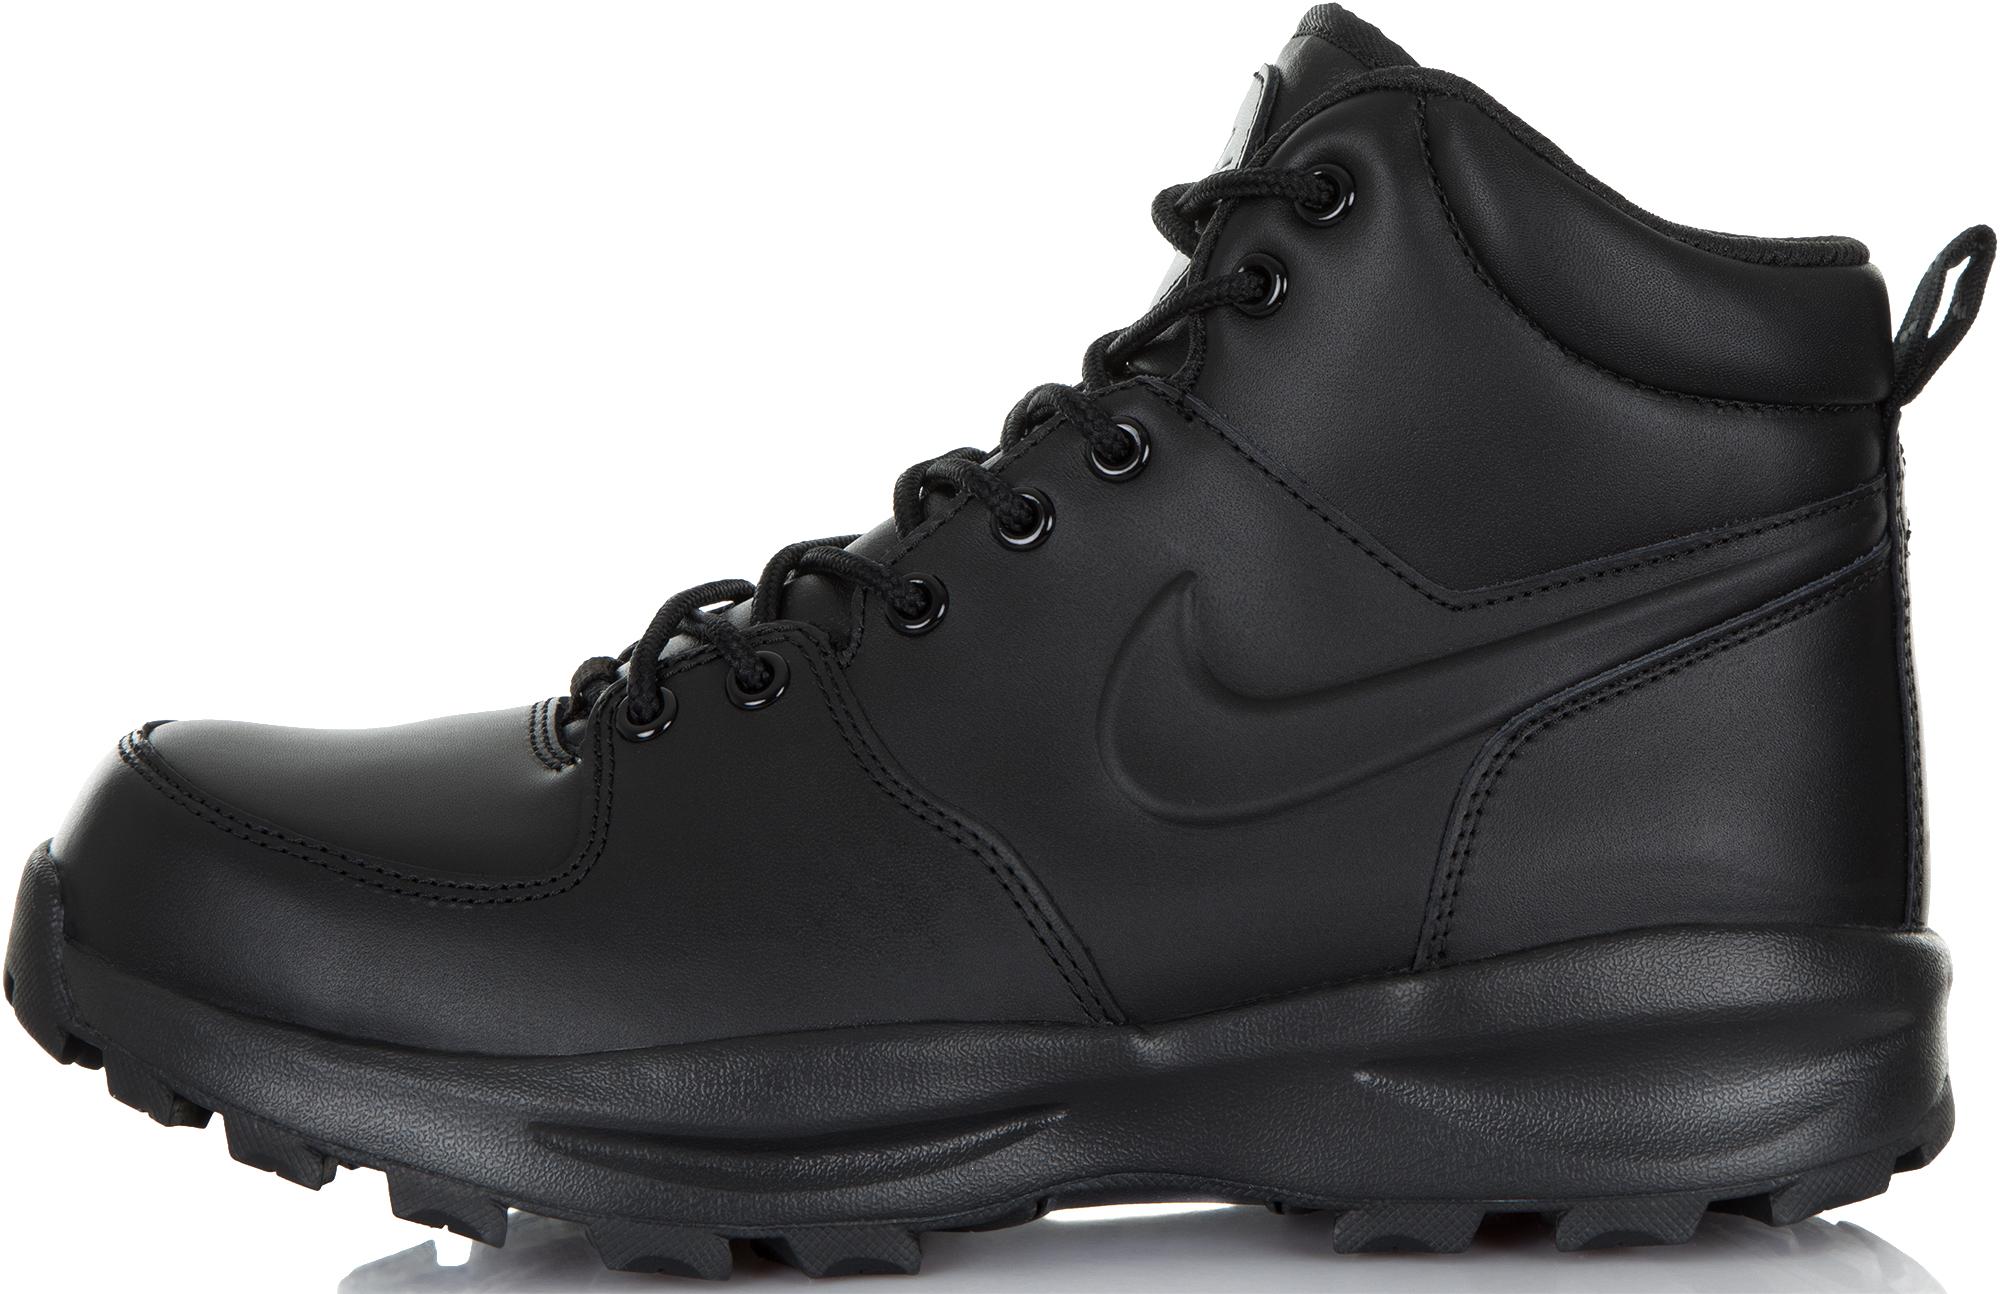 Nike Кроссовки утепленные мужские Nike Manoa Leather, размер 44 цена 2017